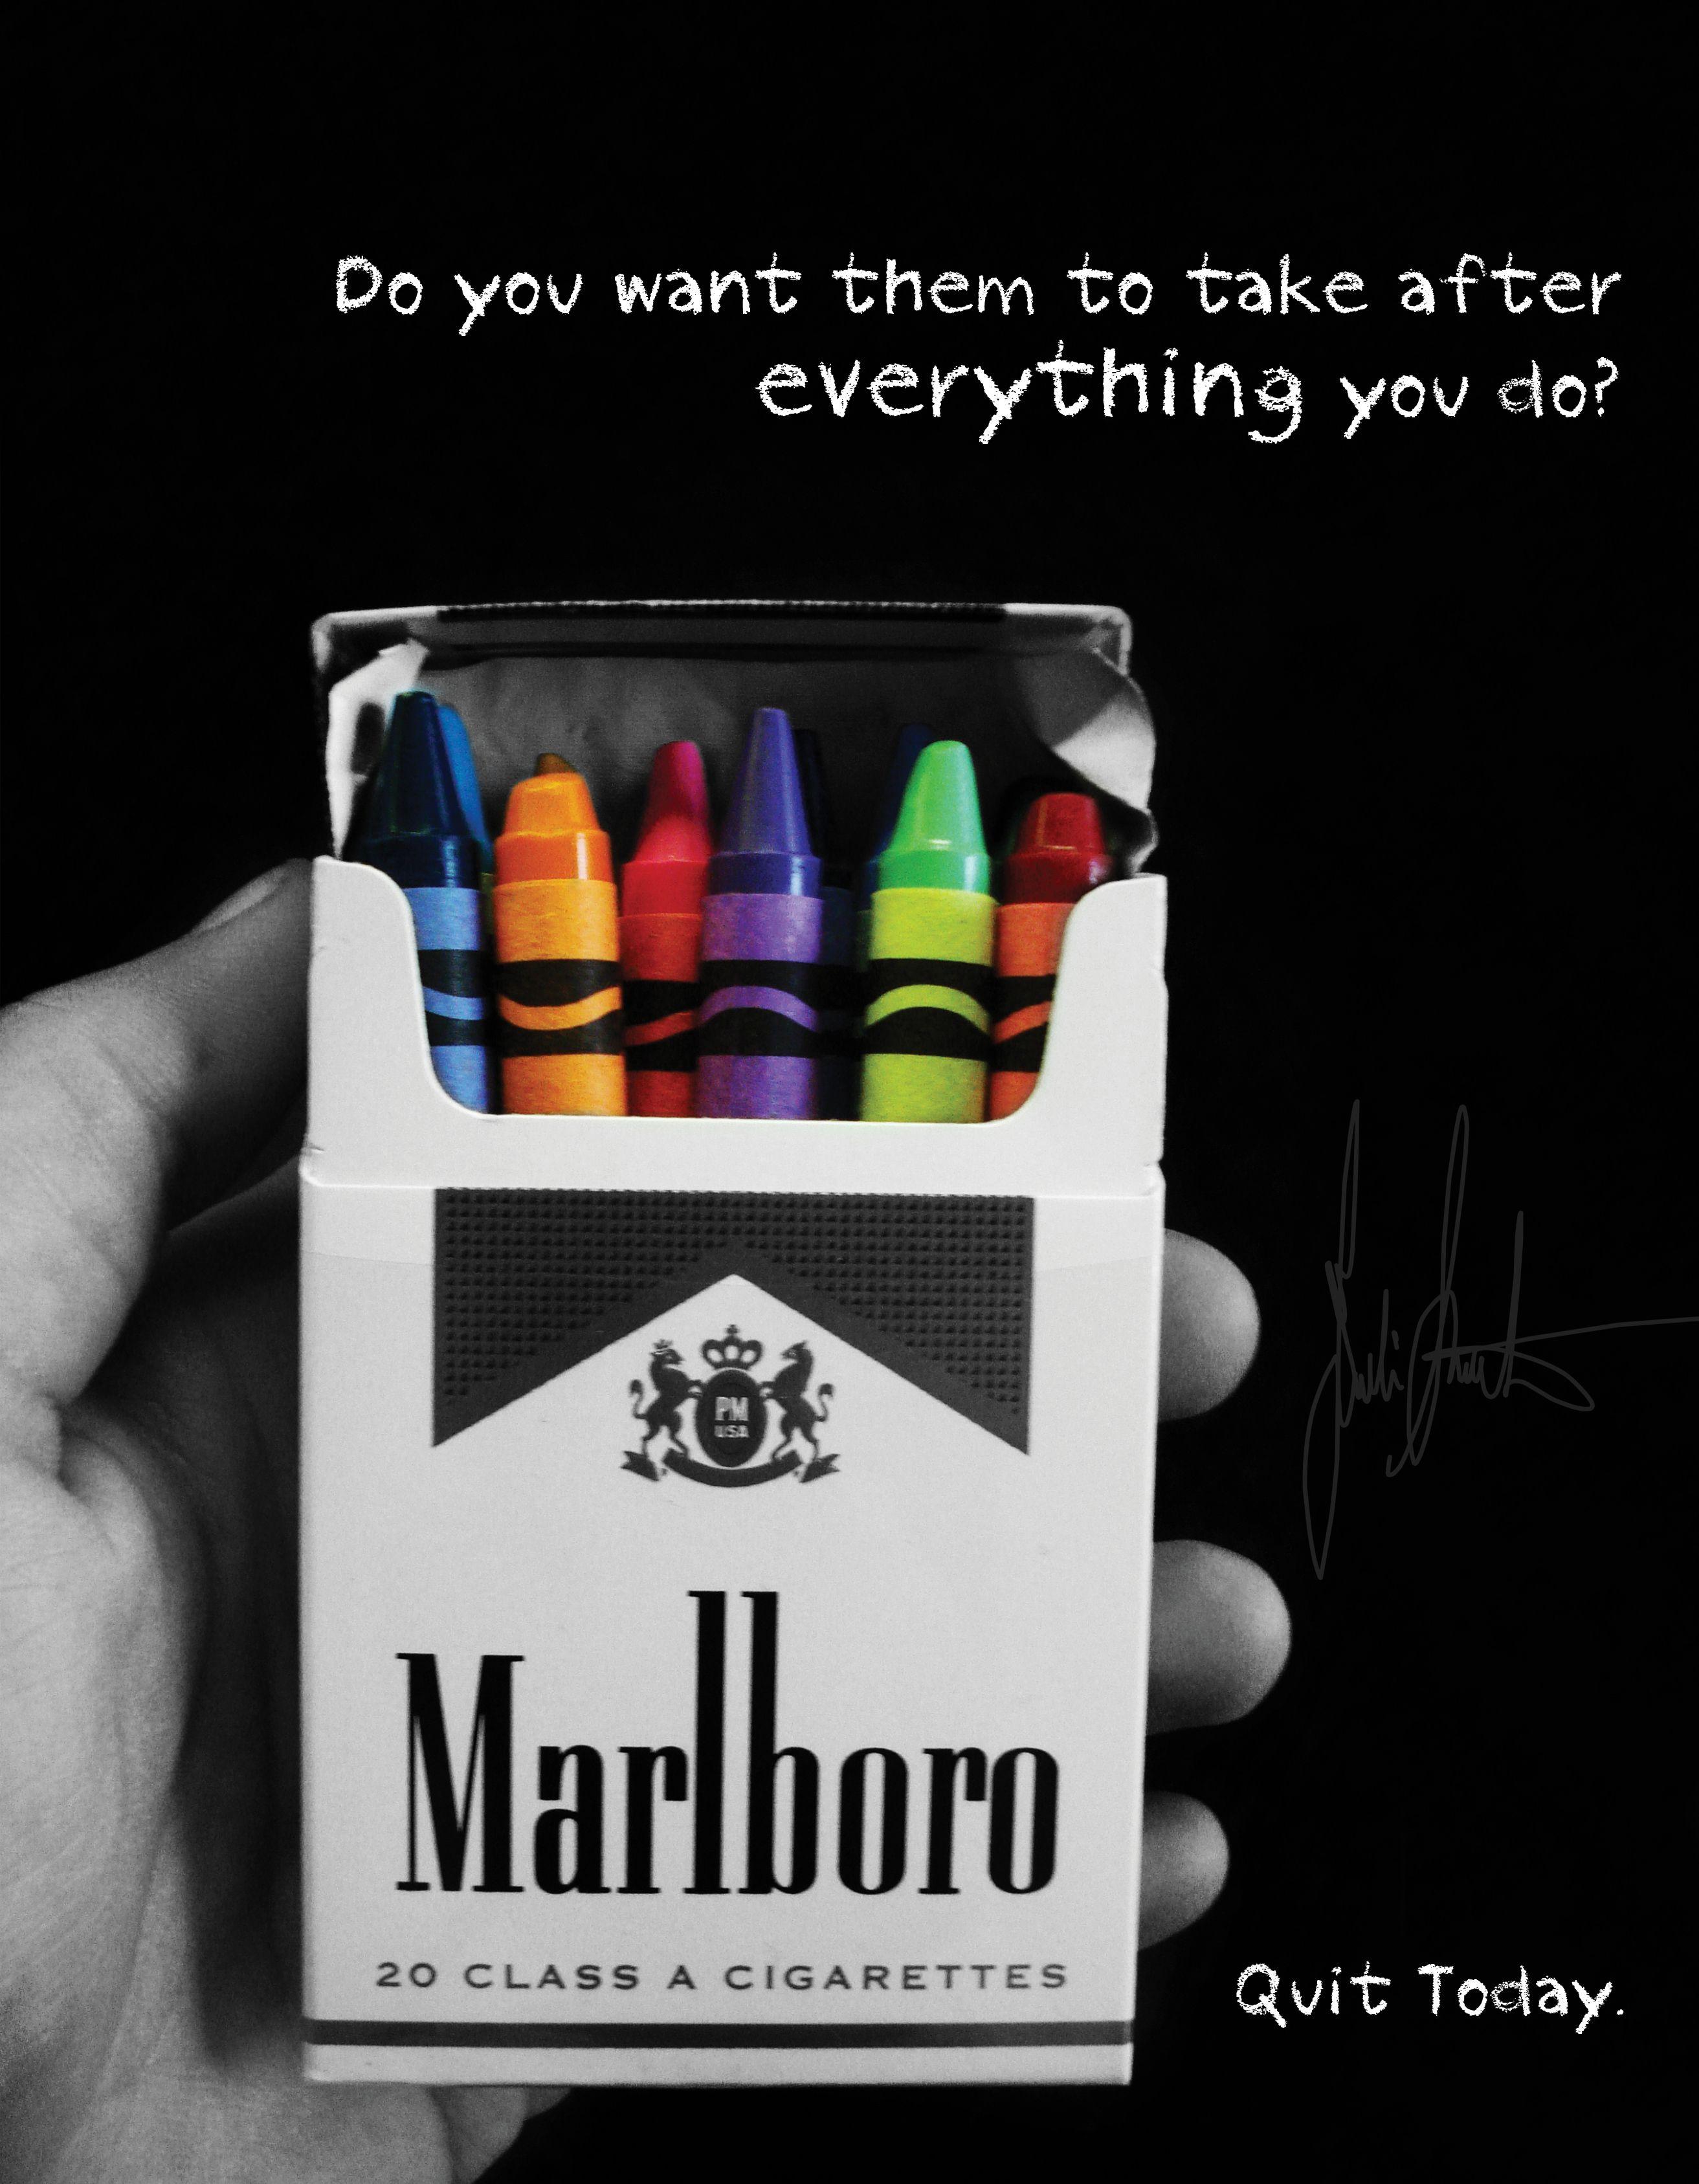 1. Headline The headline of the advertisement is 'Malboro ...